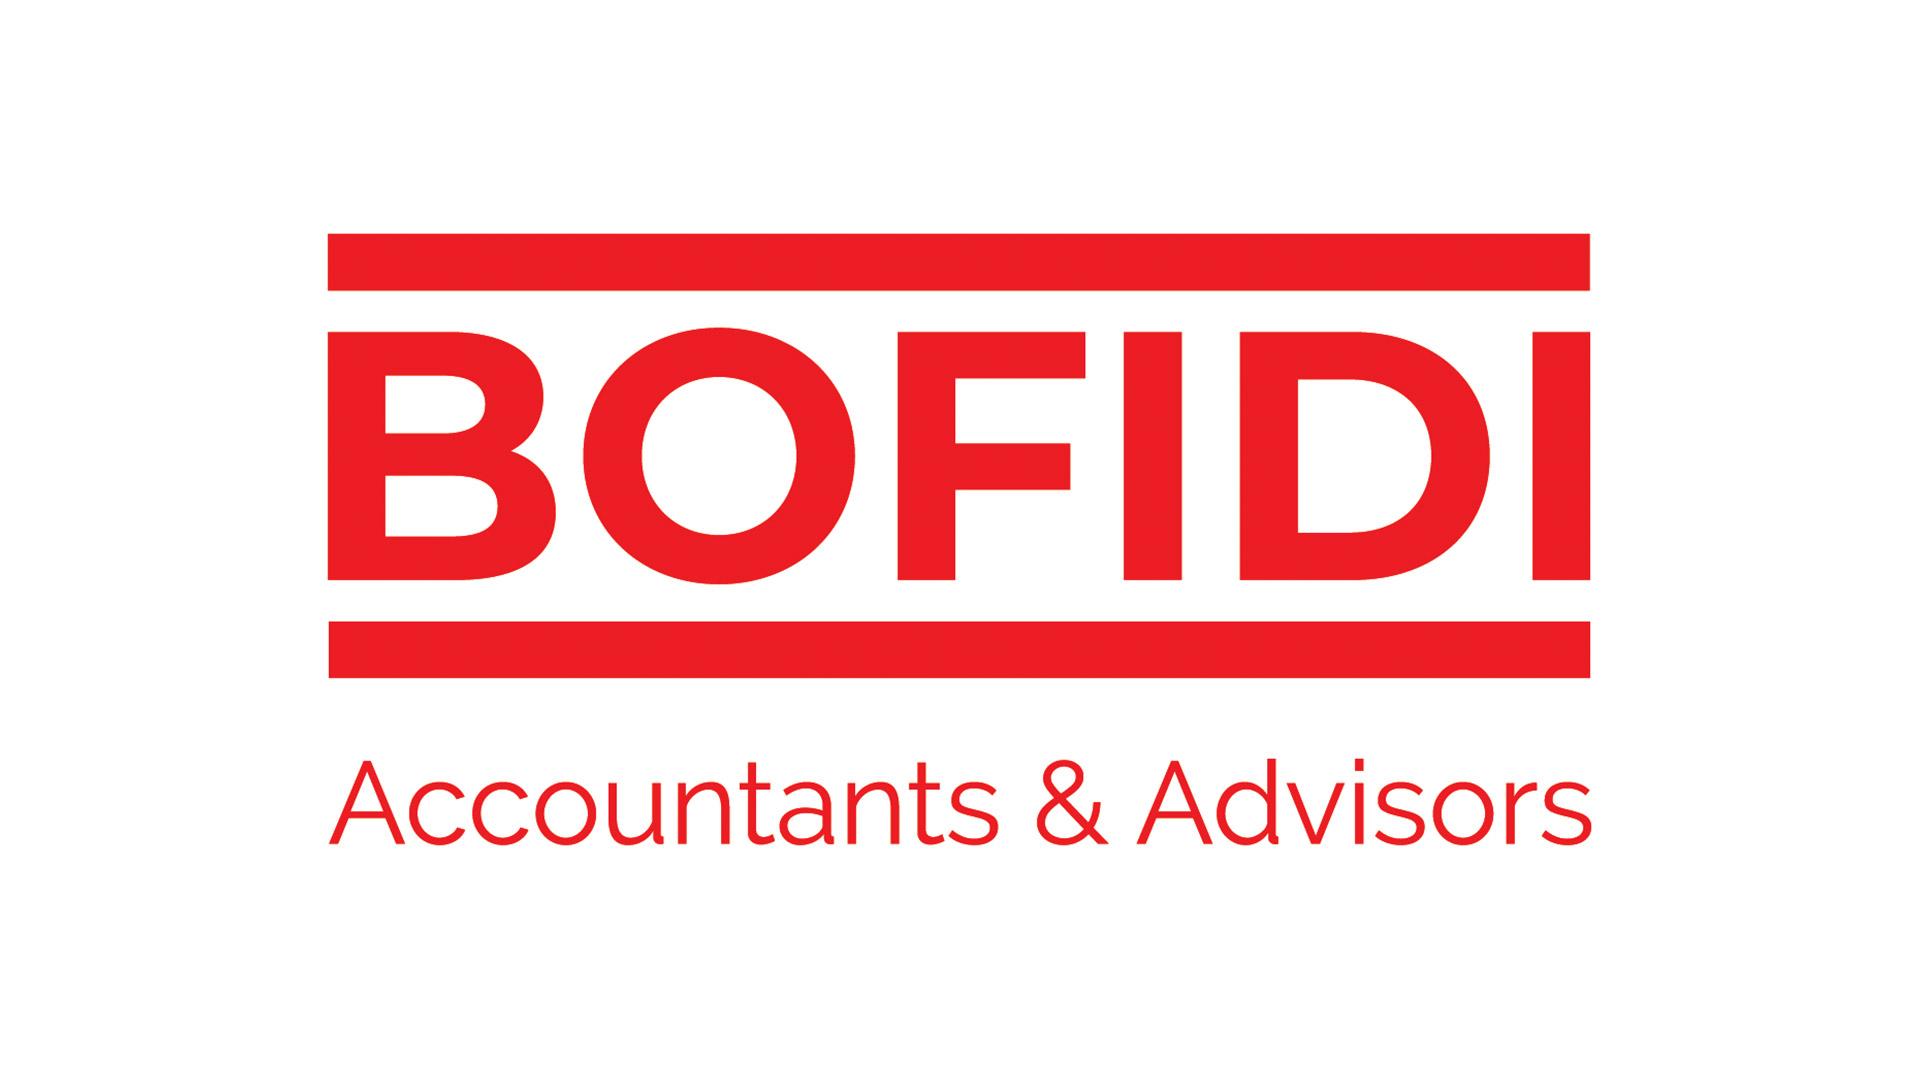 BOFIDI_CMYK_corporatelogo_baseline_coralred_white-XL